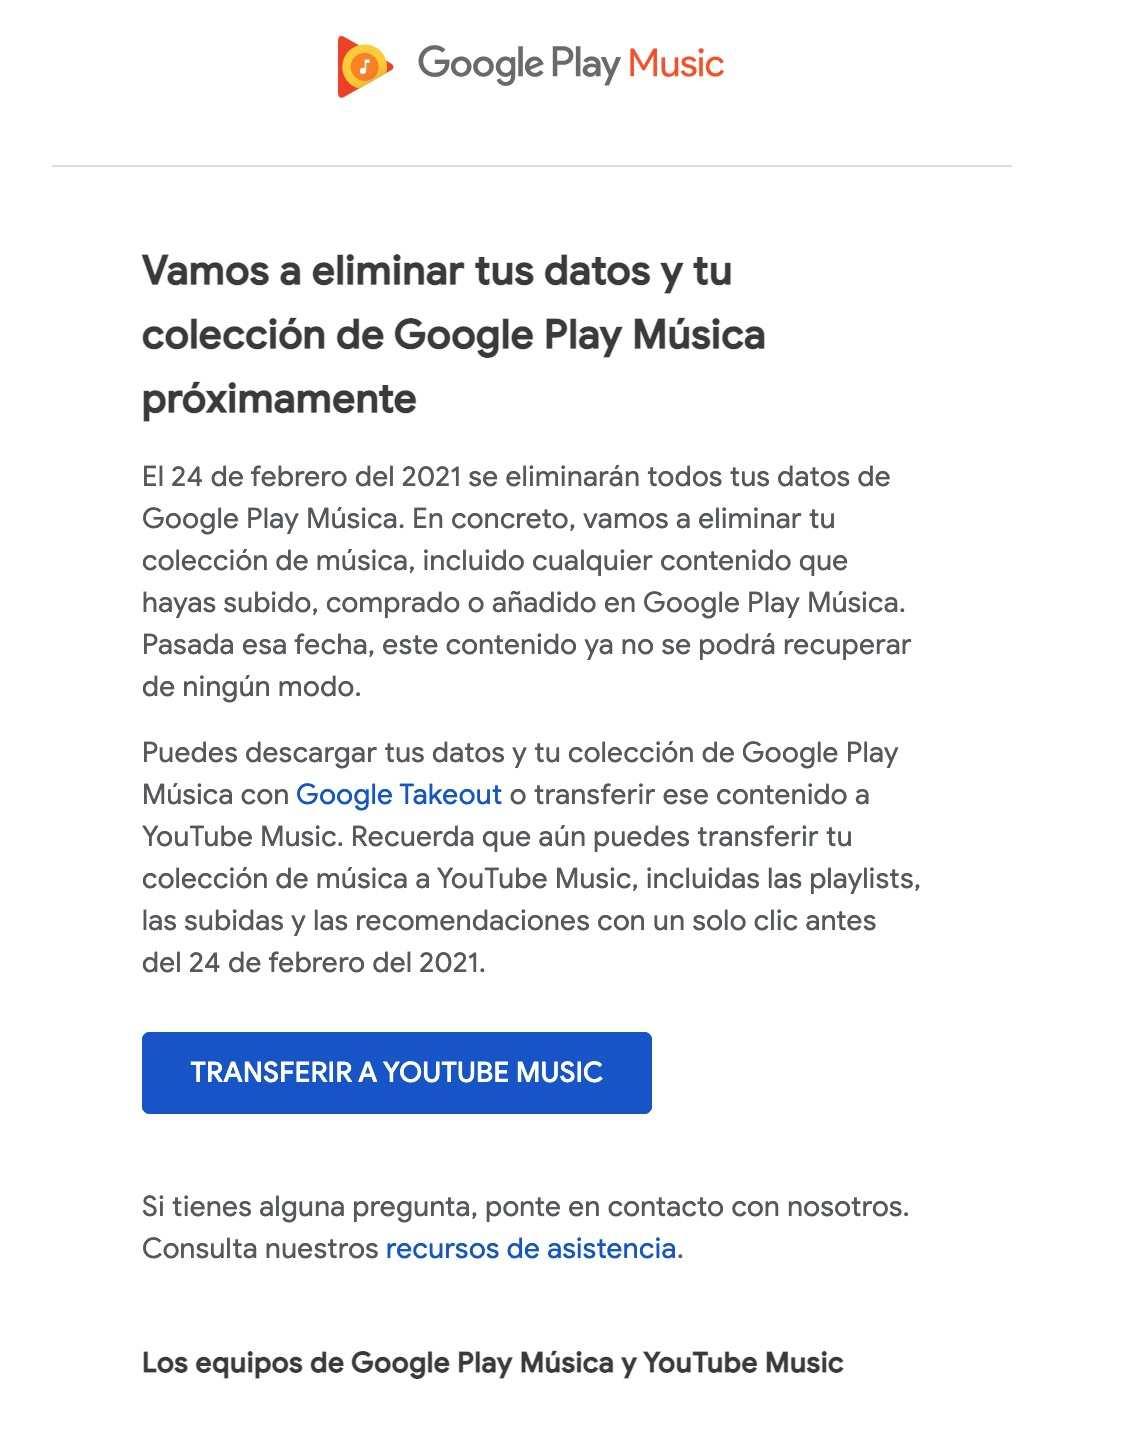 Aviso de Google Play Music